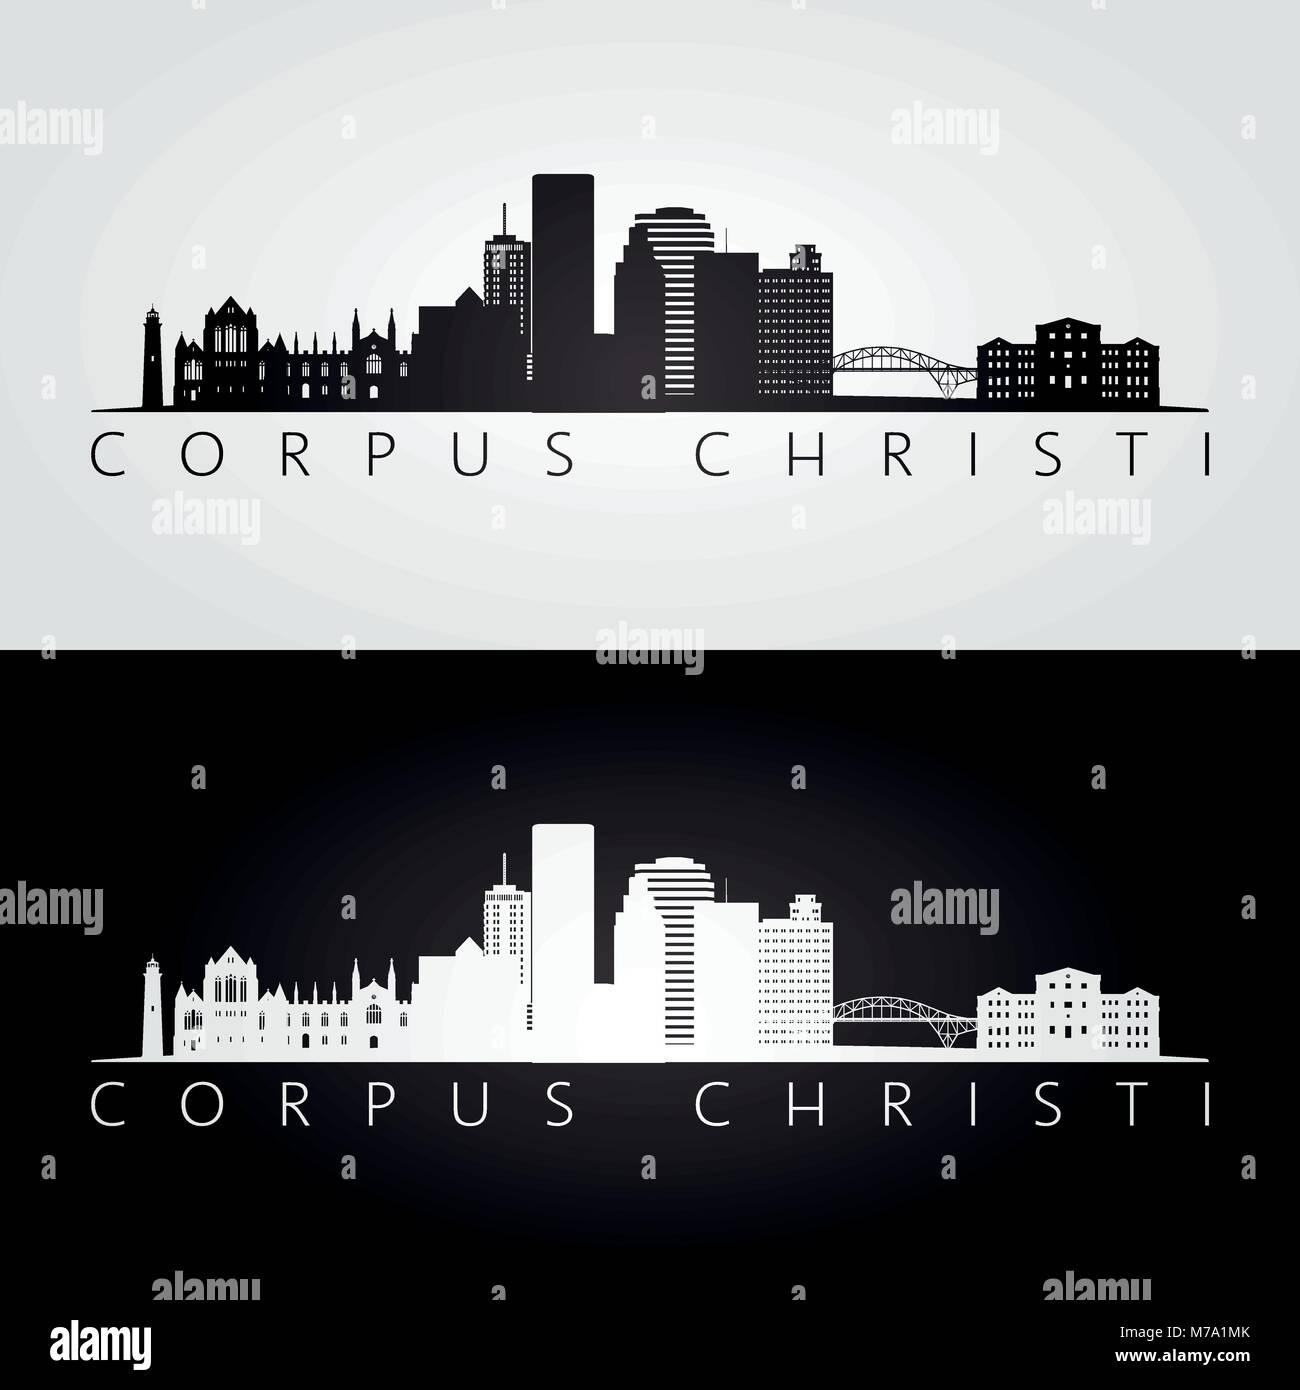 Corpus Christi usa skyline and landmarks silhouette, black and white design, vector illustration. - Stock Vector